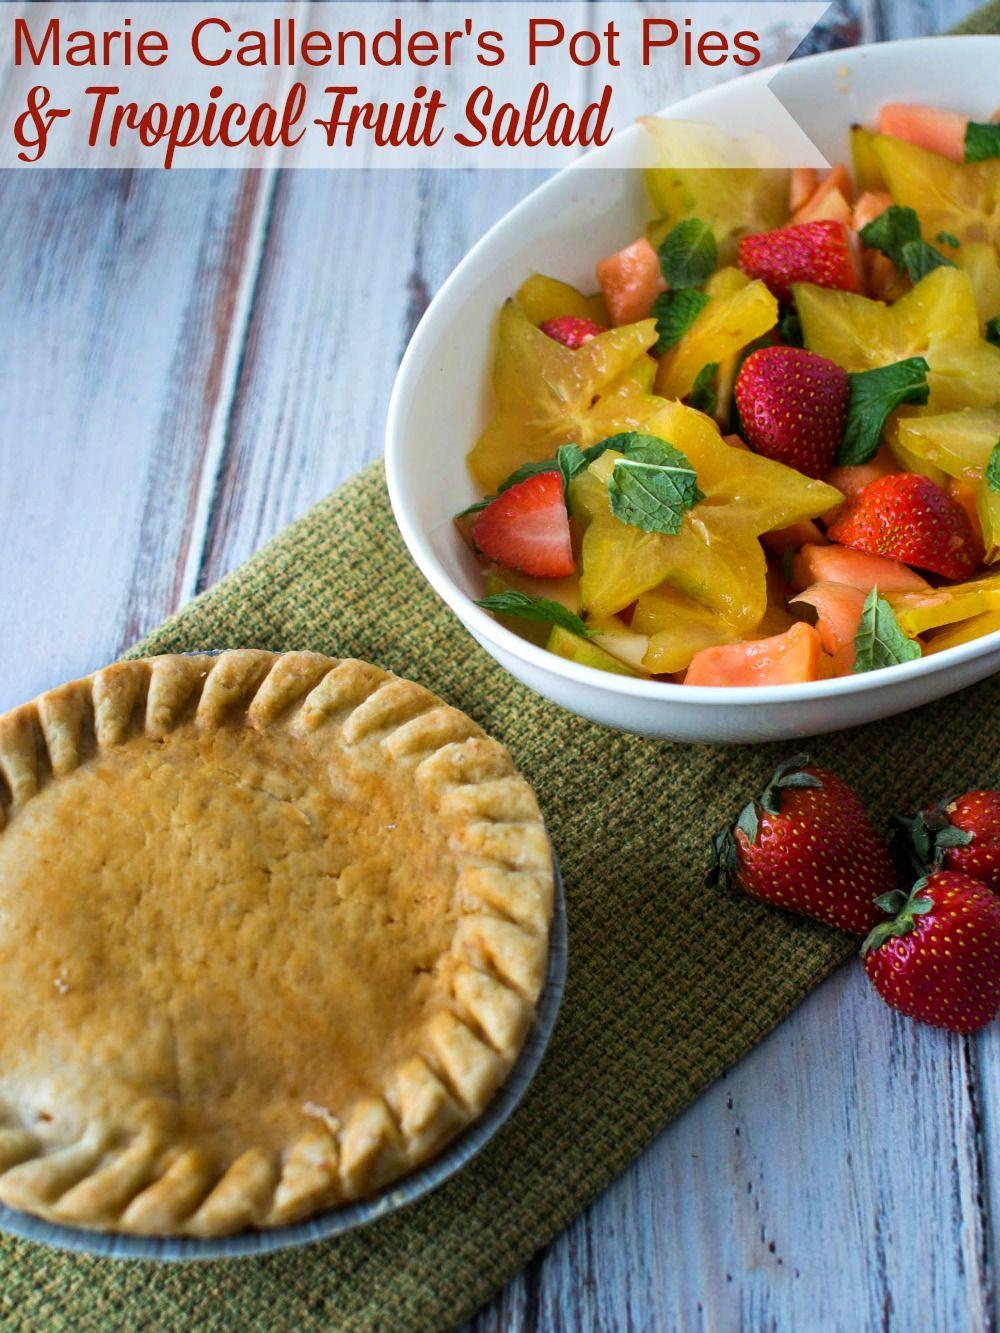 Marie Callender's Pot Pies & Tropical Fruit Salad  #EasyAsPotPie #Ad